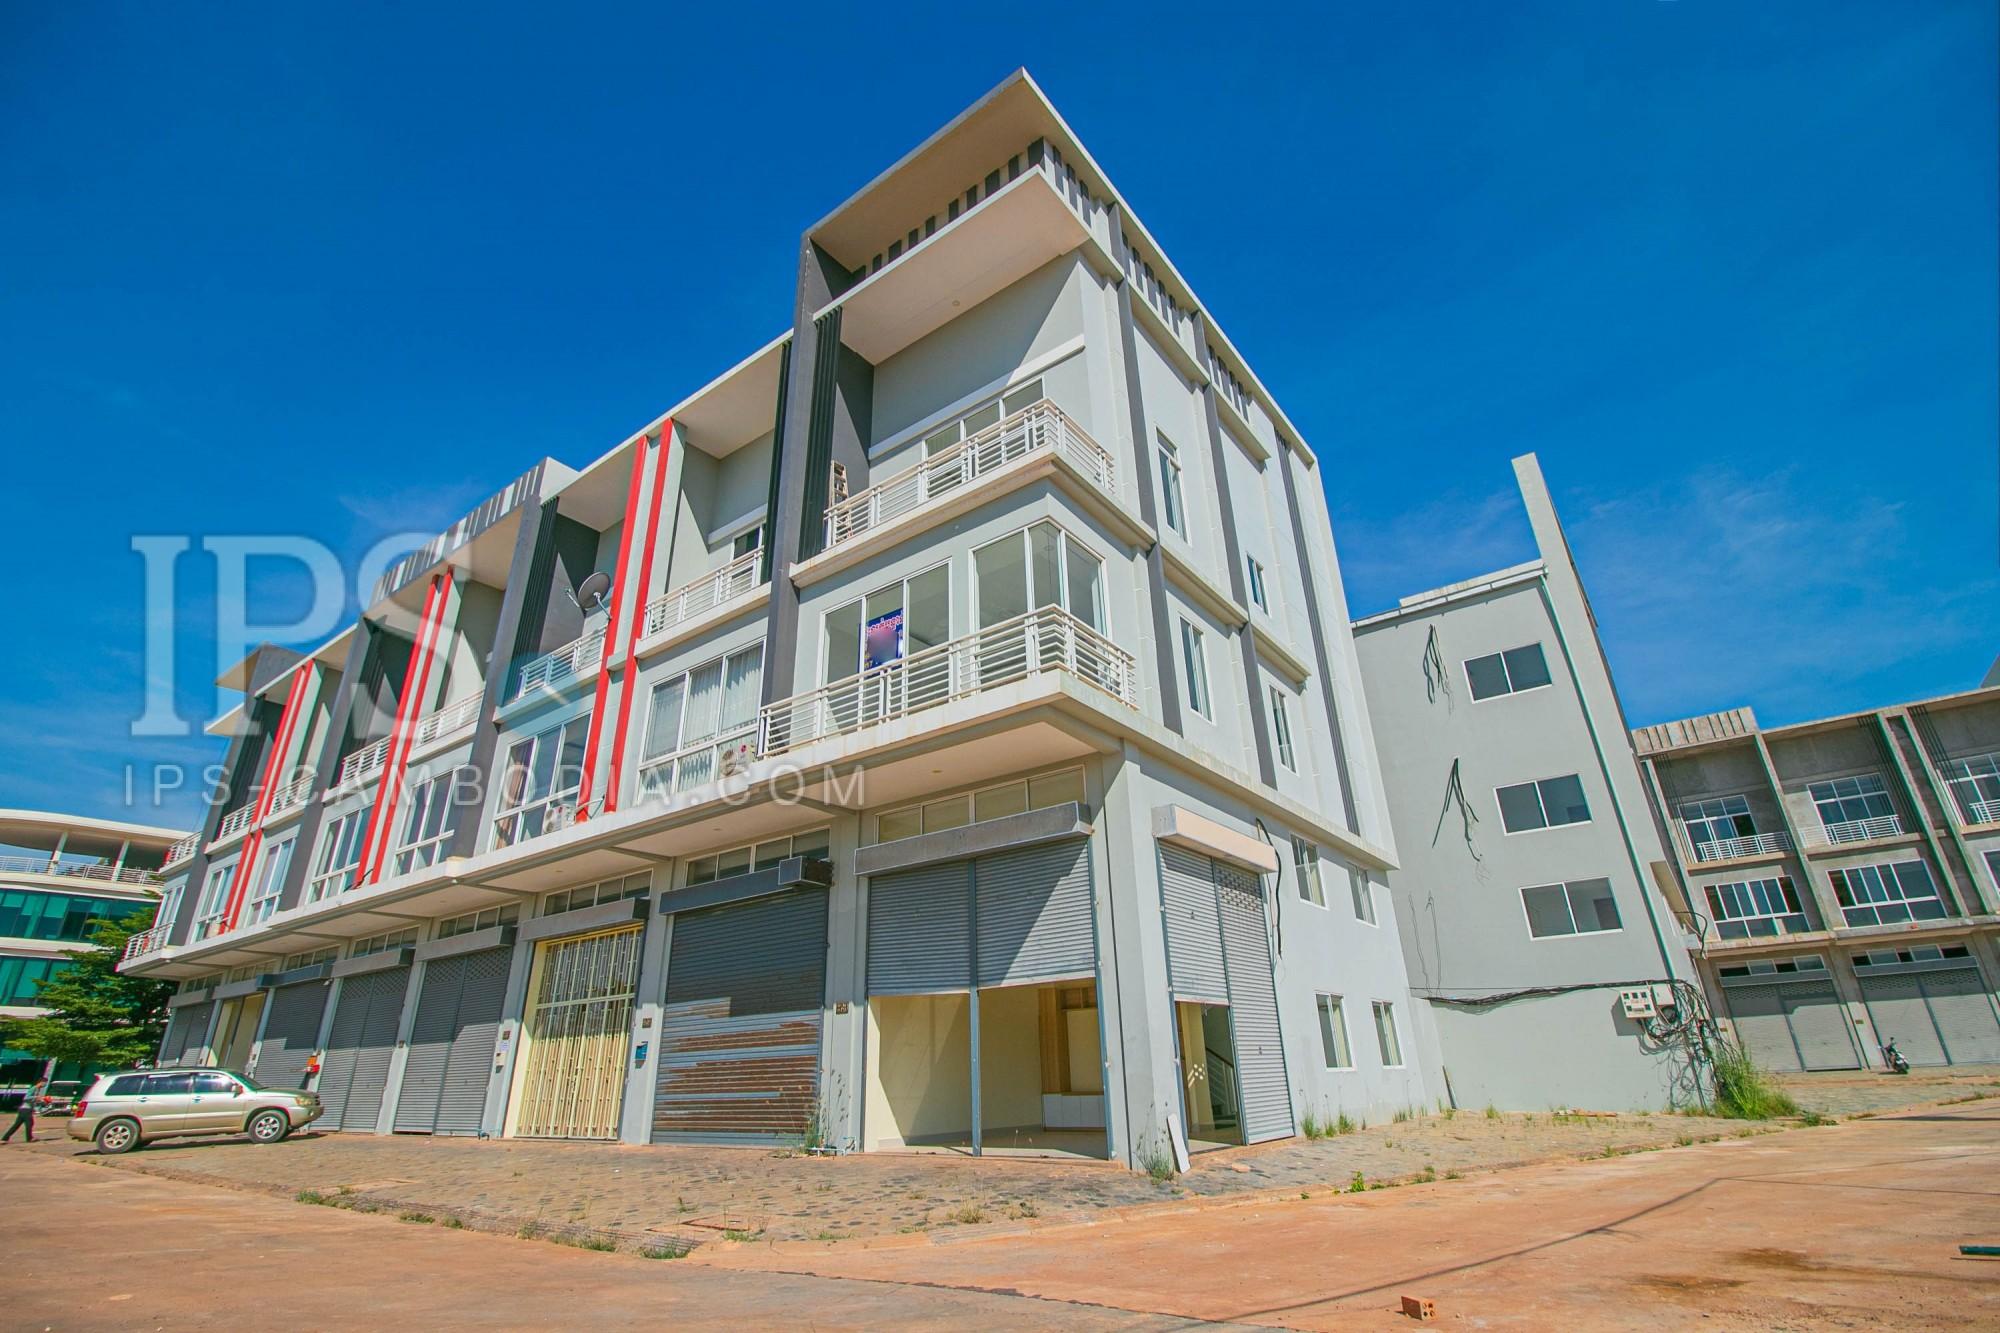 5 Bedroom Flat For Sale - Svay Dangkum, Siem Reap